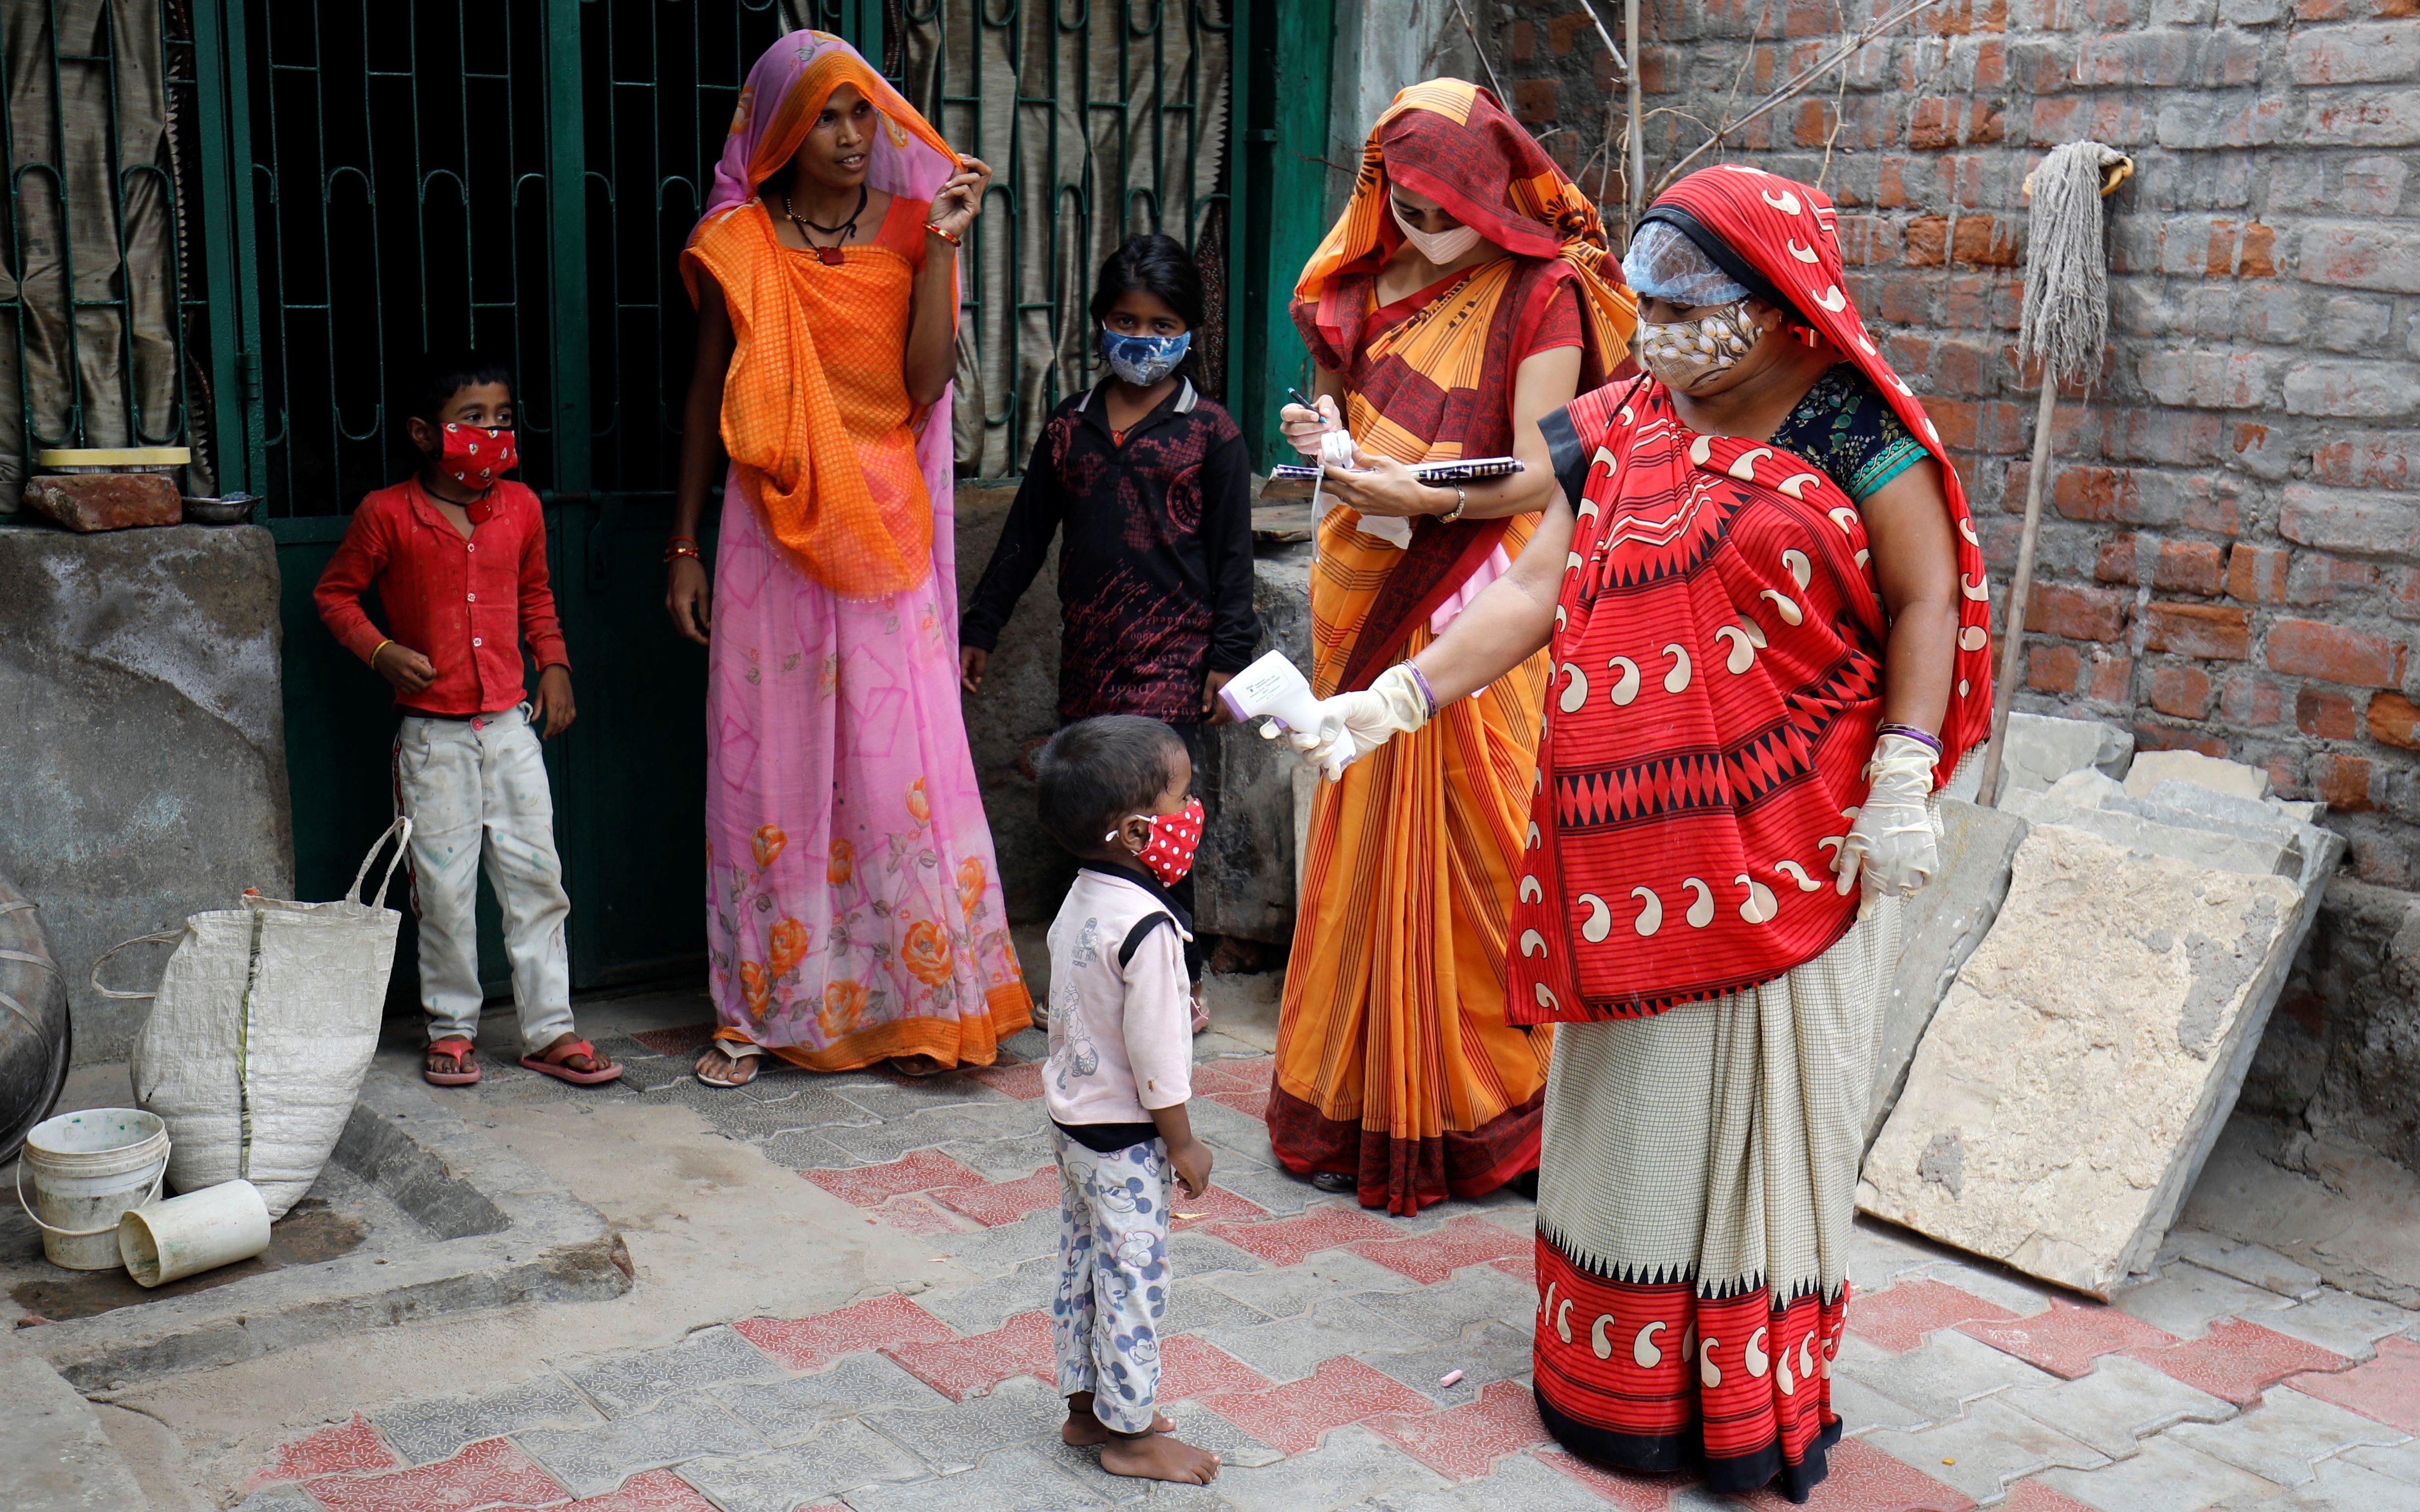 The spread of coronavirus disease on the outskirts of Ahmedabad